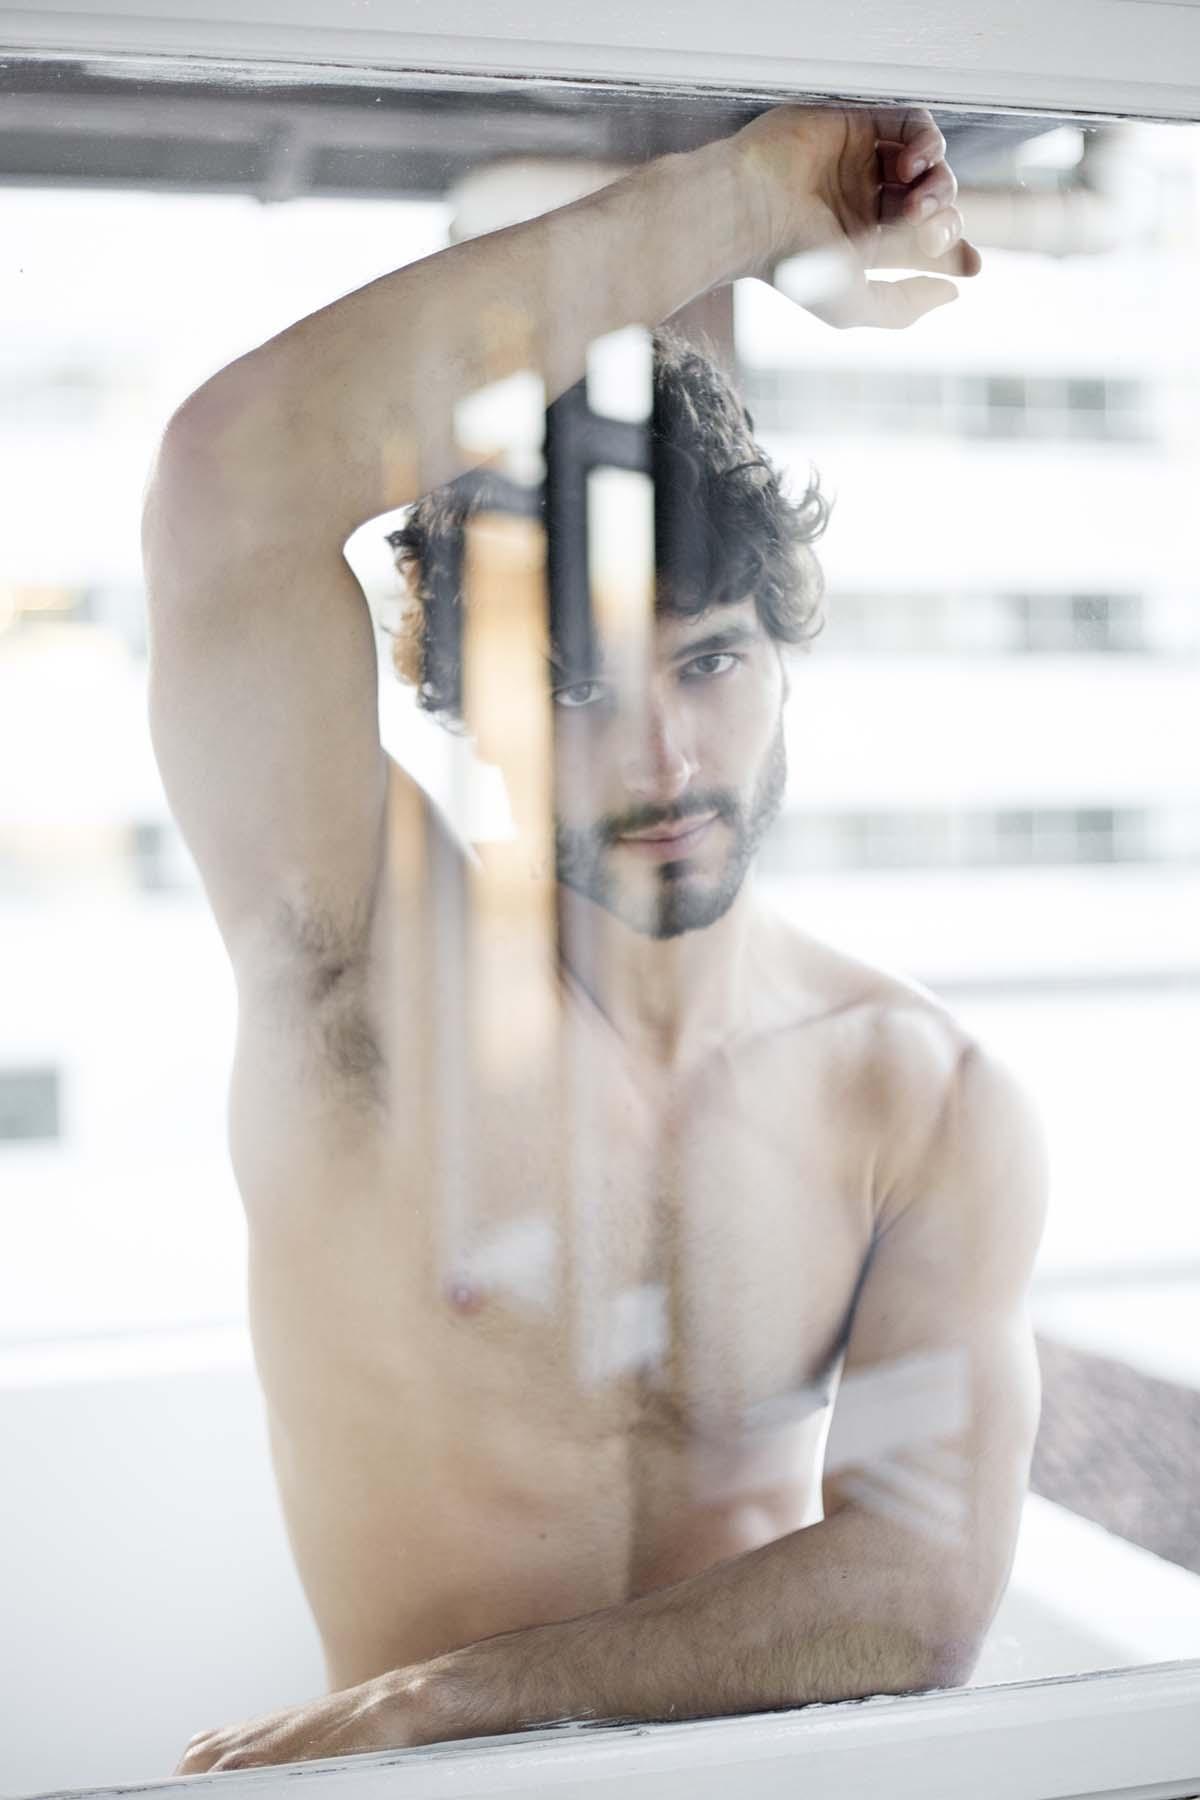 Thiago Sá by Filipe Galgani for Brazilian Male Model